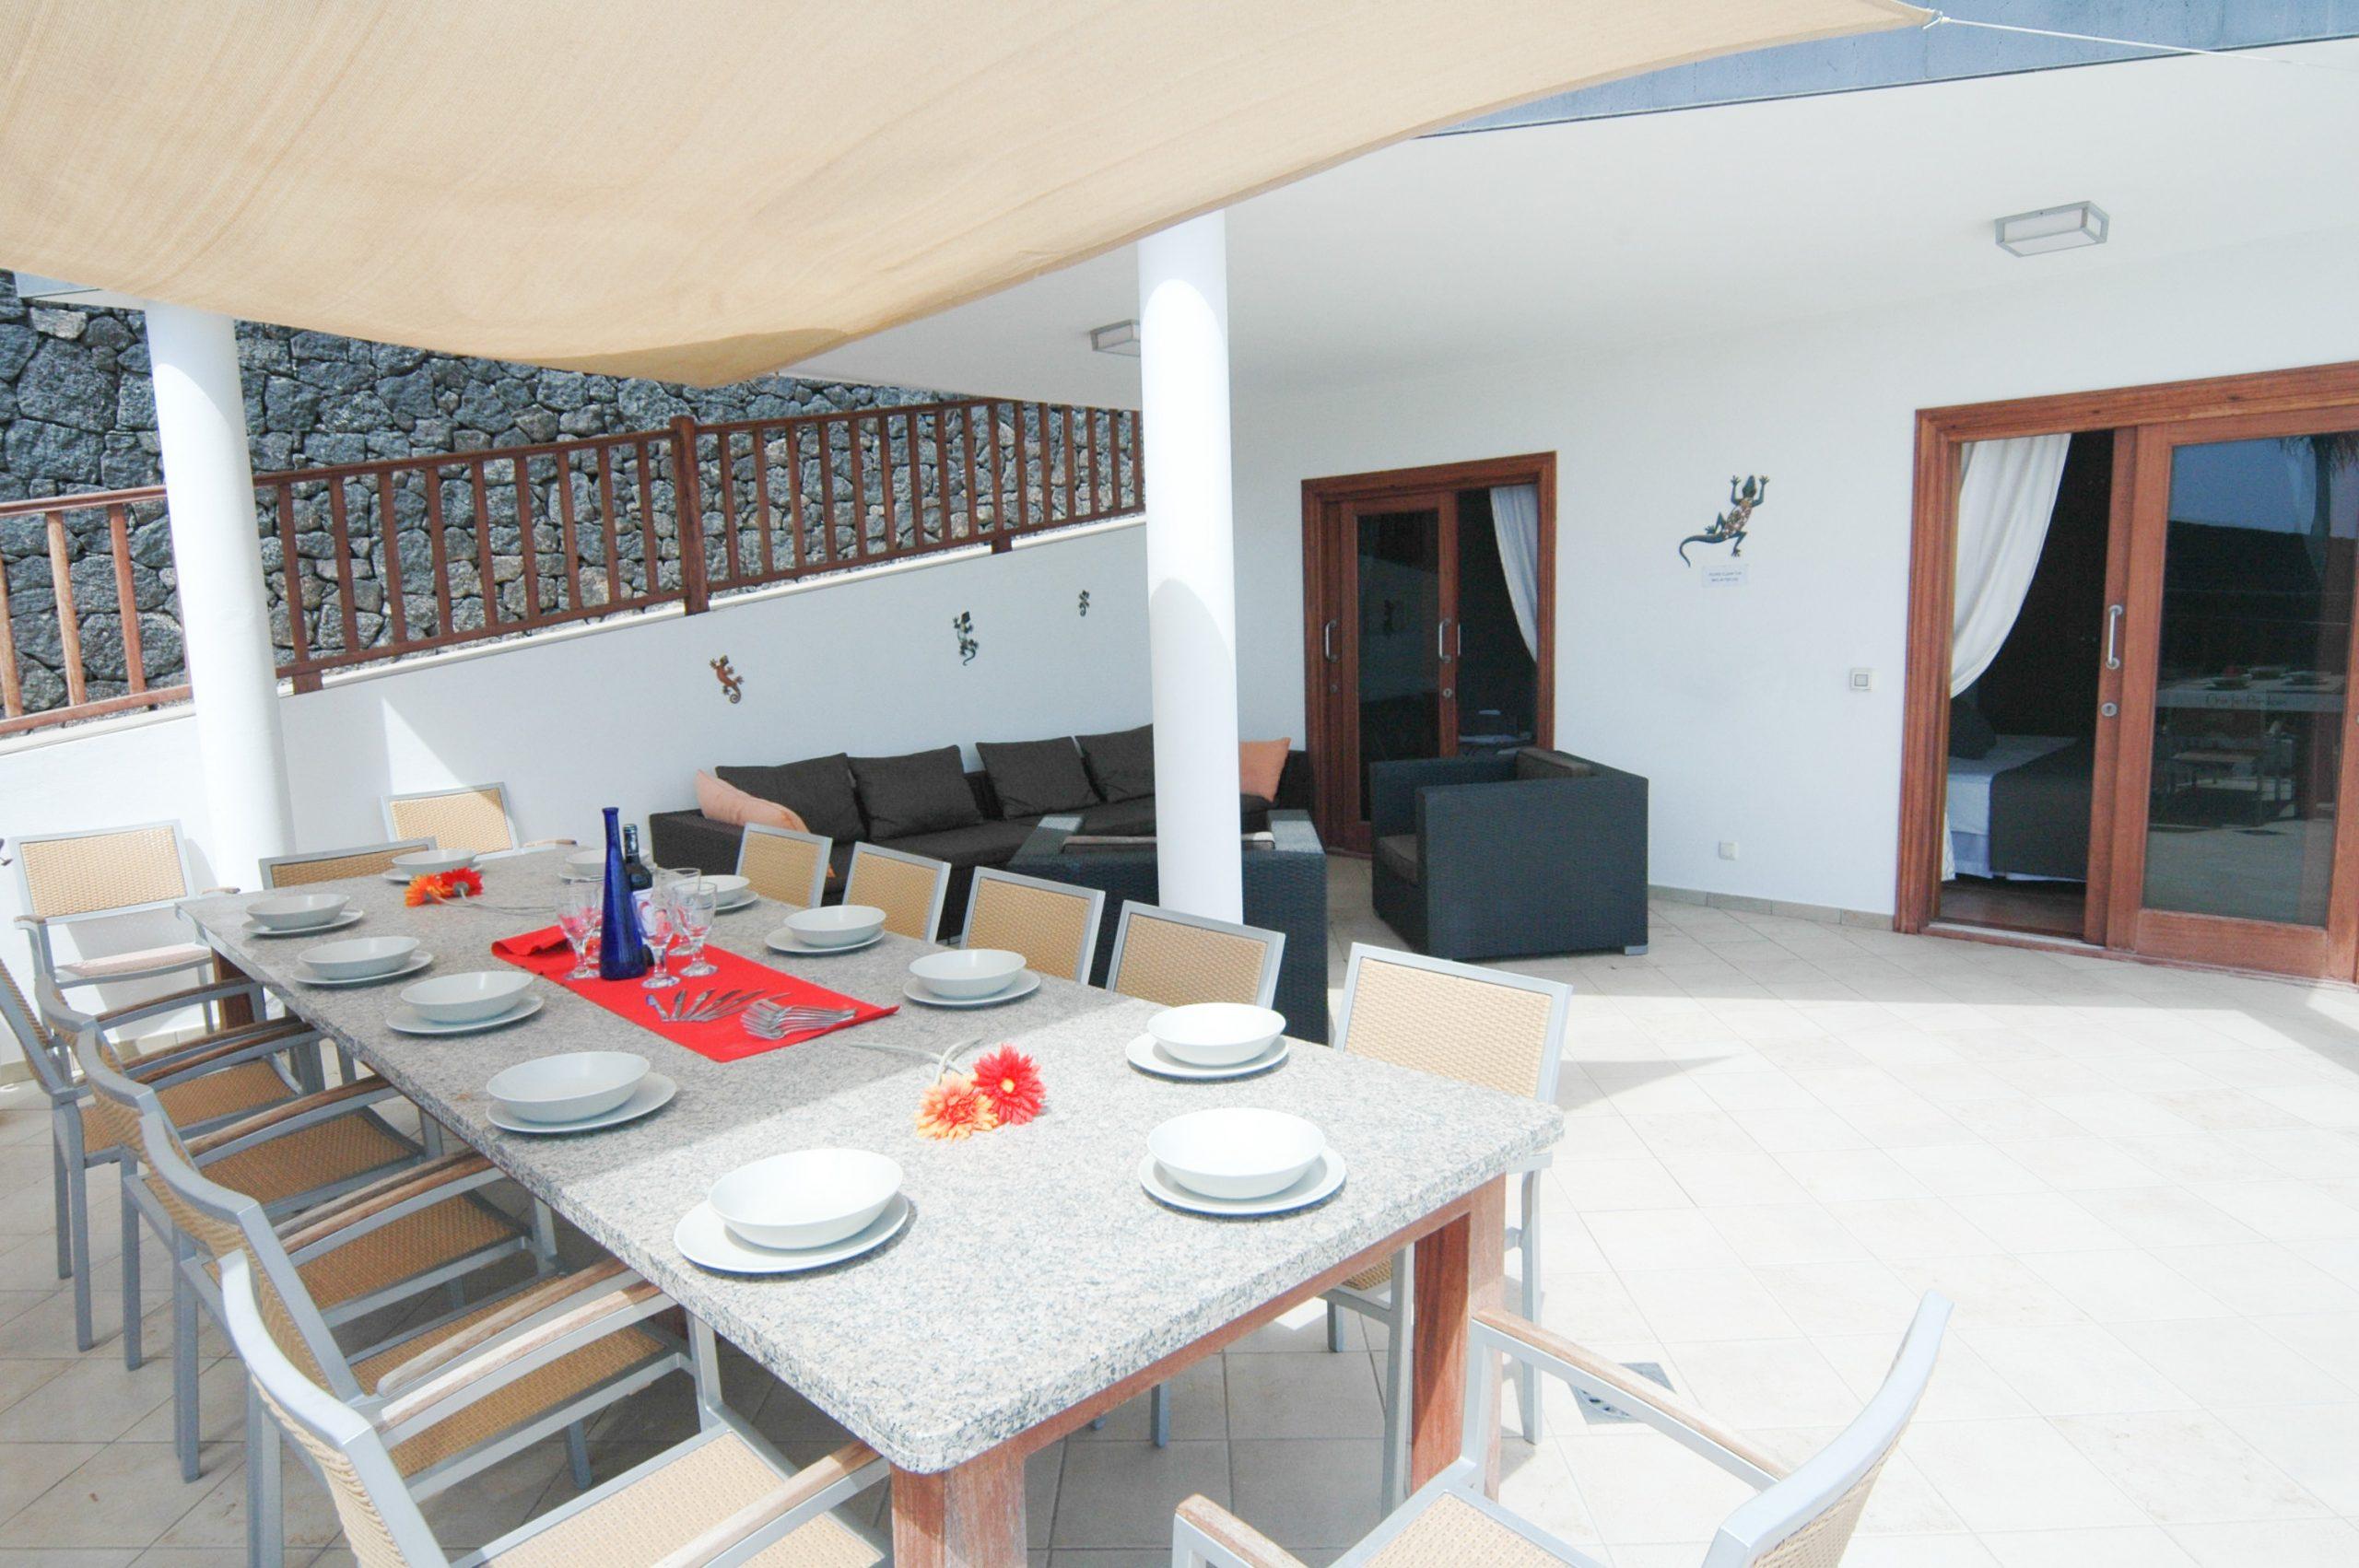 LVC216123 Holiday villa and terrace area